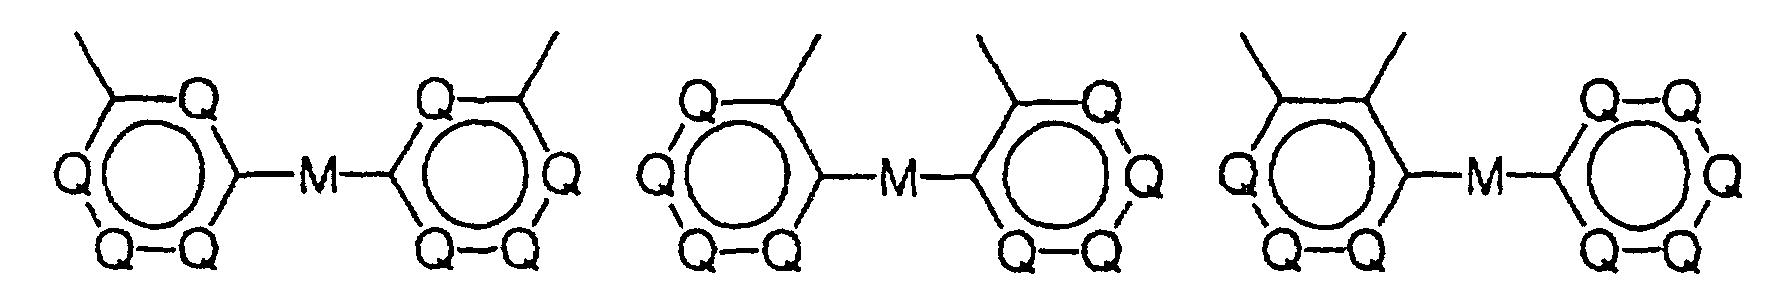 Figure 00040004